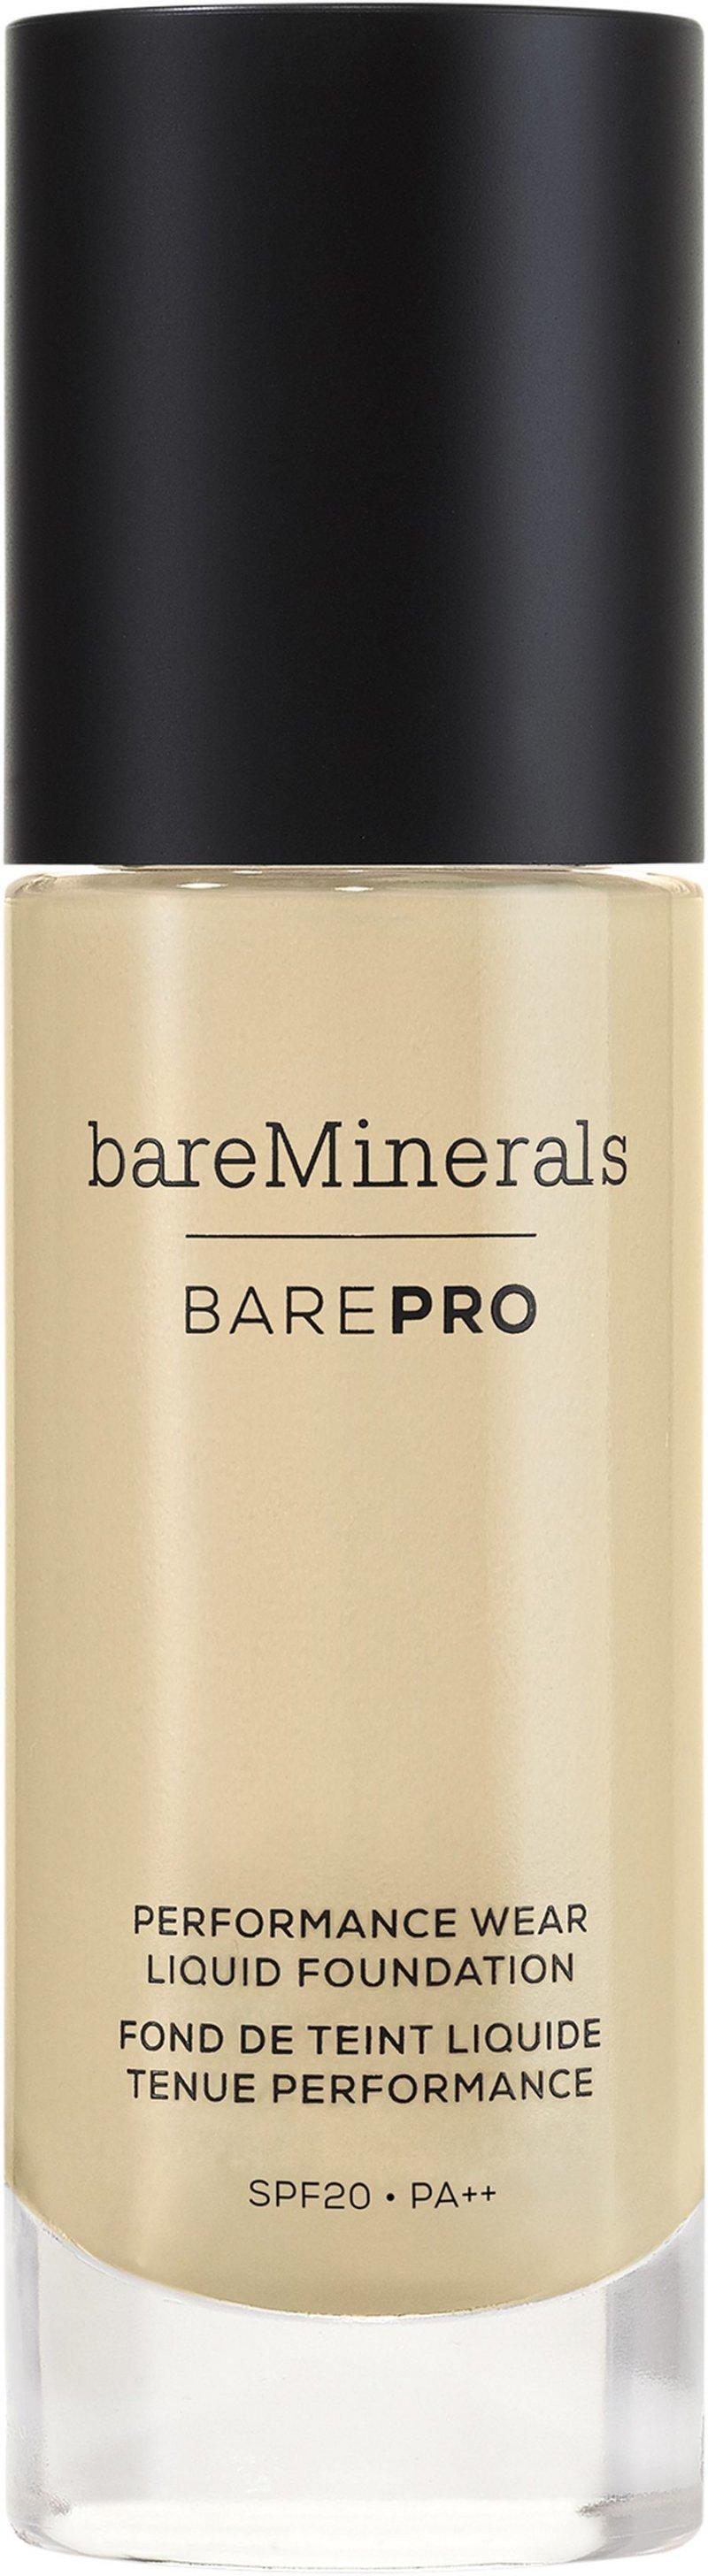 Image of   Bareminerals Foundation - Barepro Performance Wear Liquid - Cashmere 06